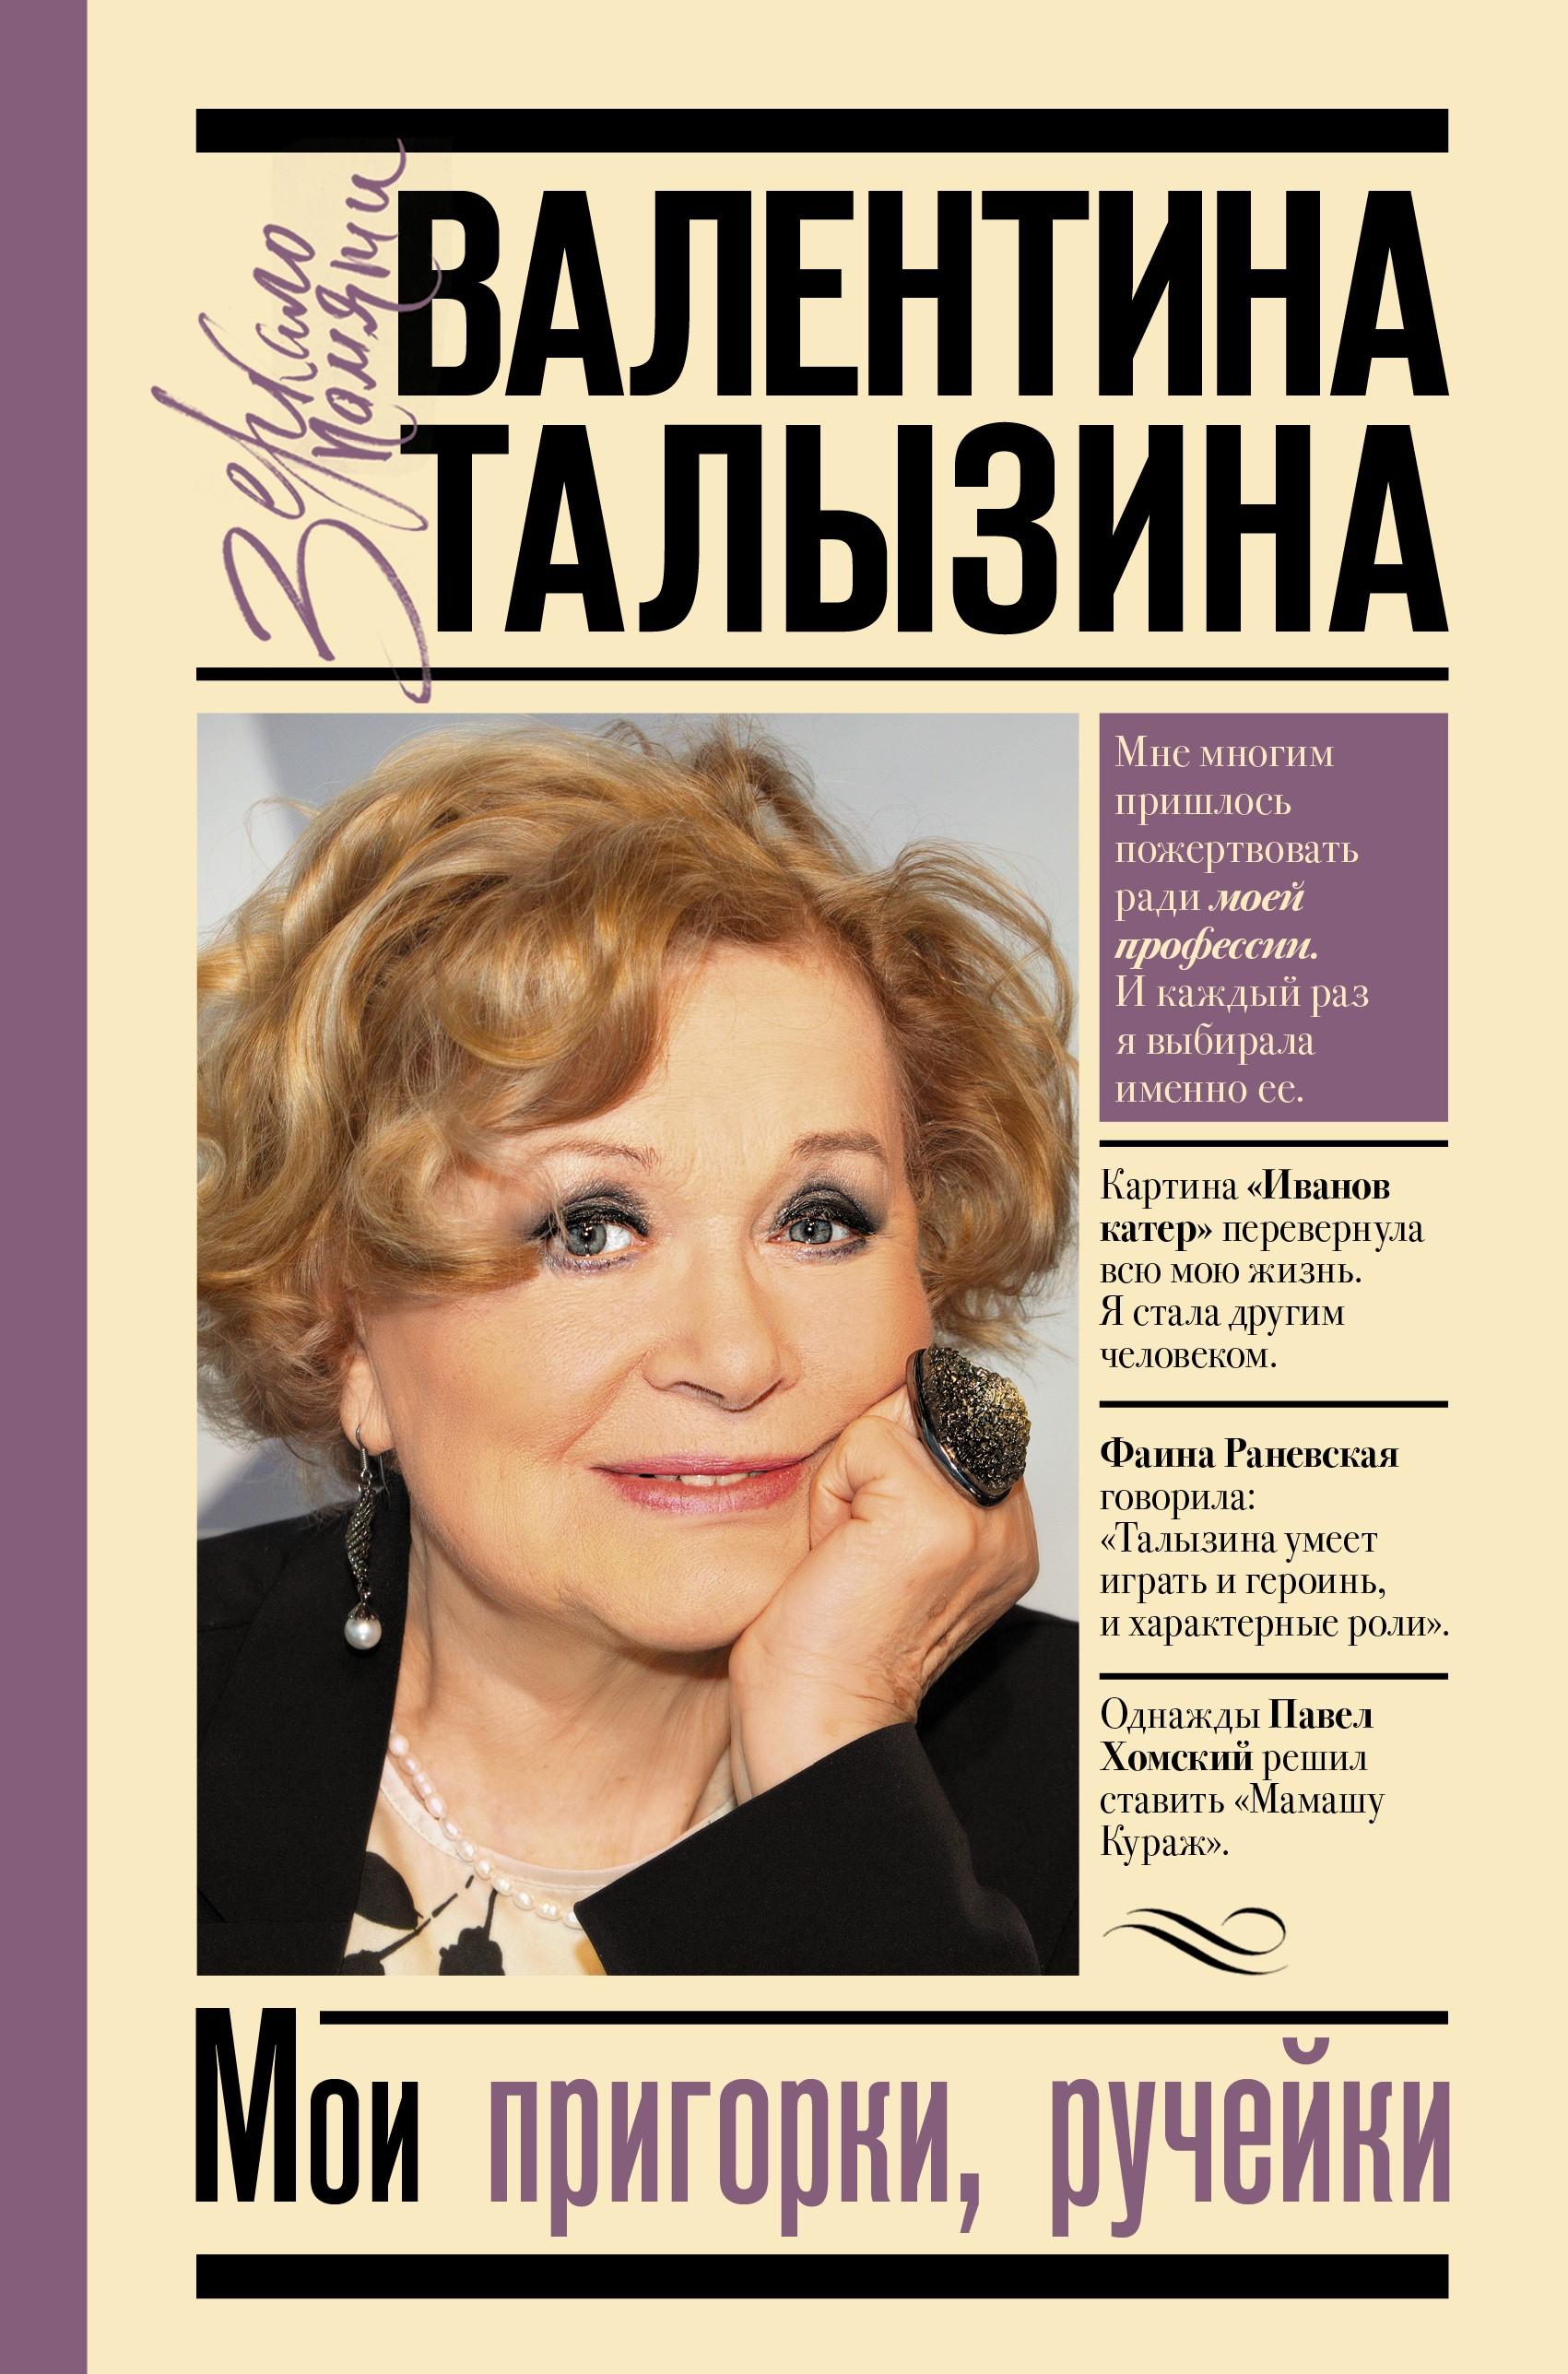 Валентина Талызина Мои пригорки, ручейки. Воспоминания актрисы валентина талызина мои пригорки ручейки воспоминания актрисы